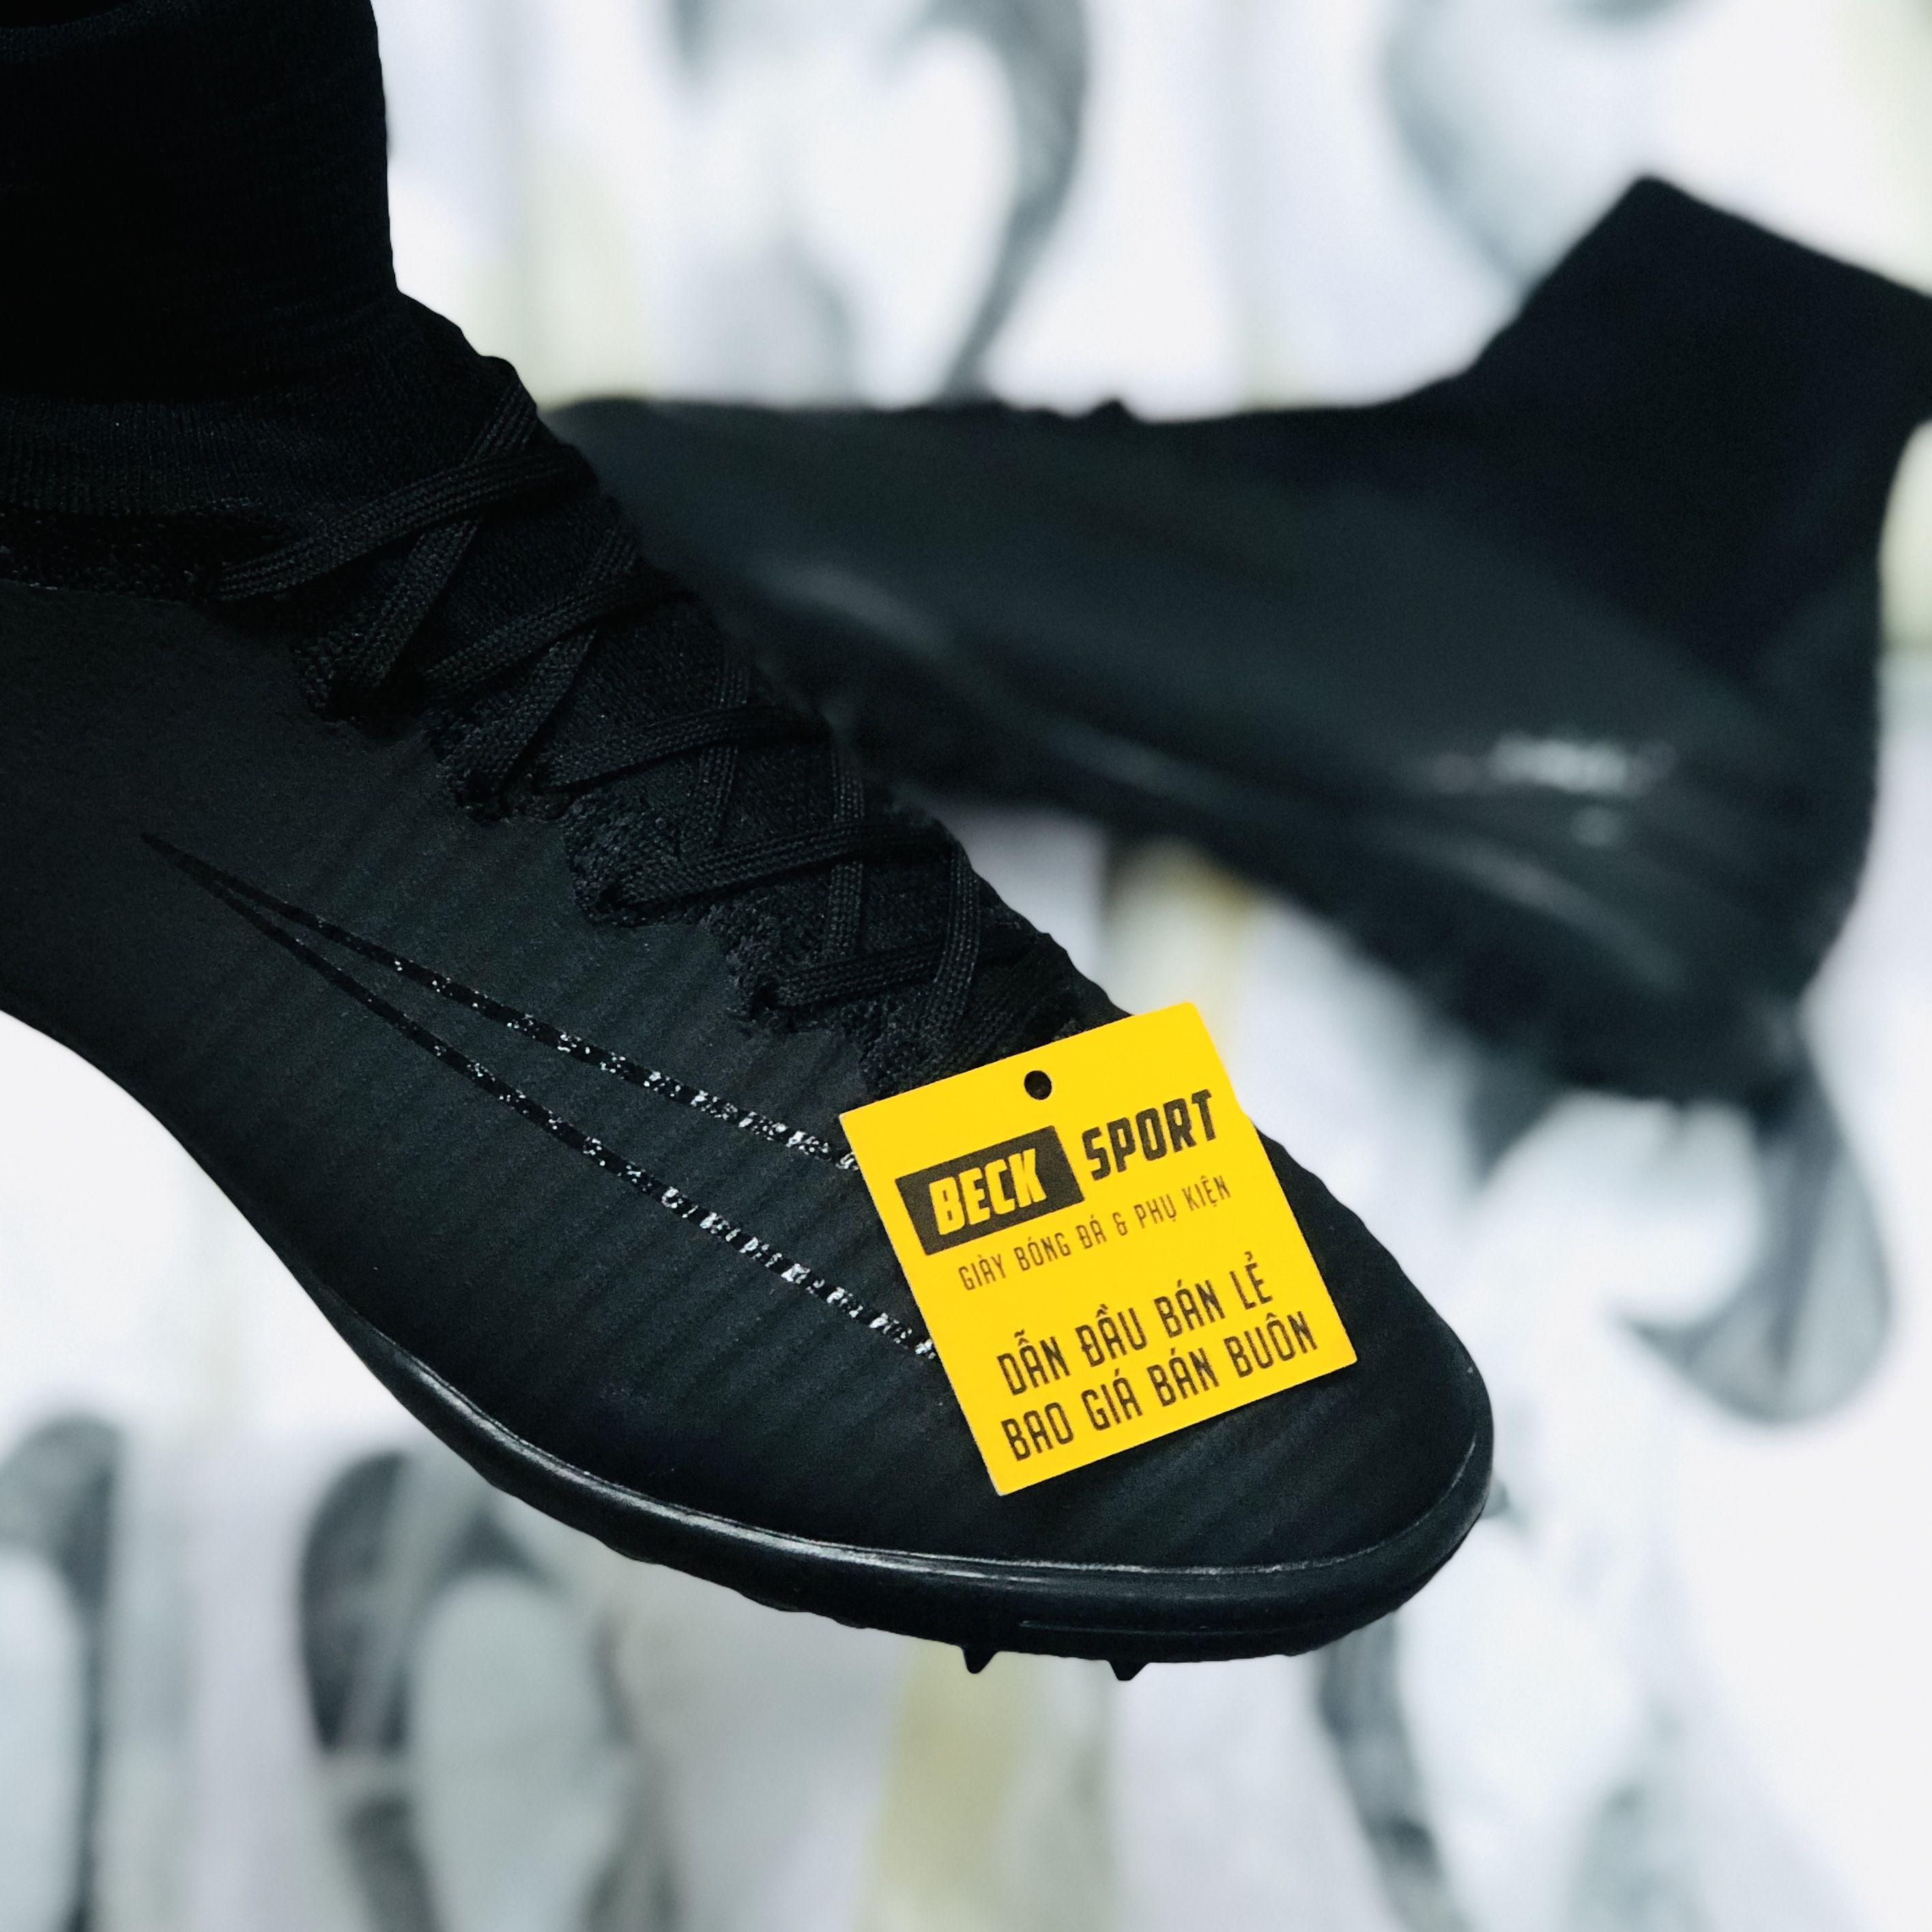 Giày Bóng Đá Nike MercurialX Superfly Đen Tuyền Cổ Cao TF